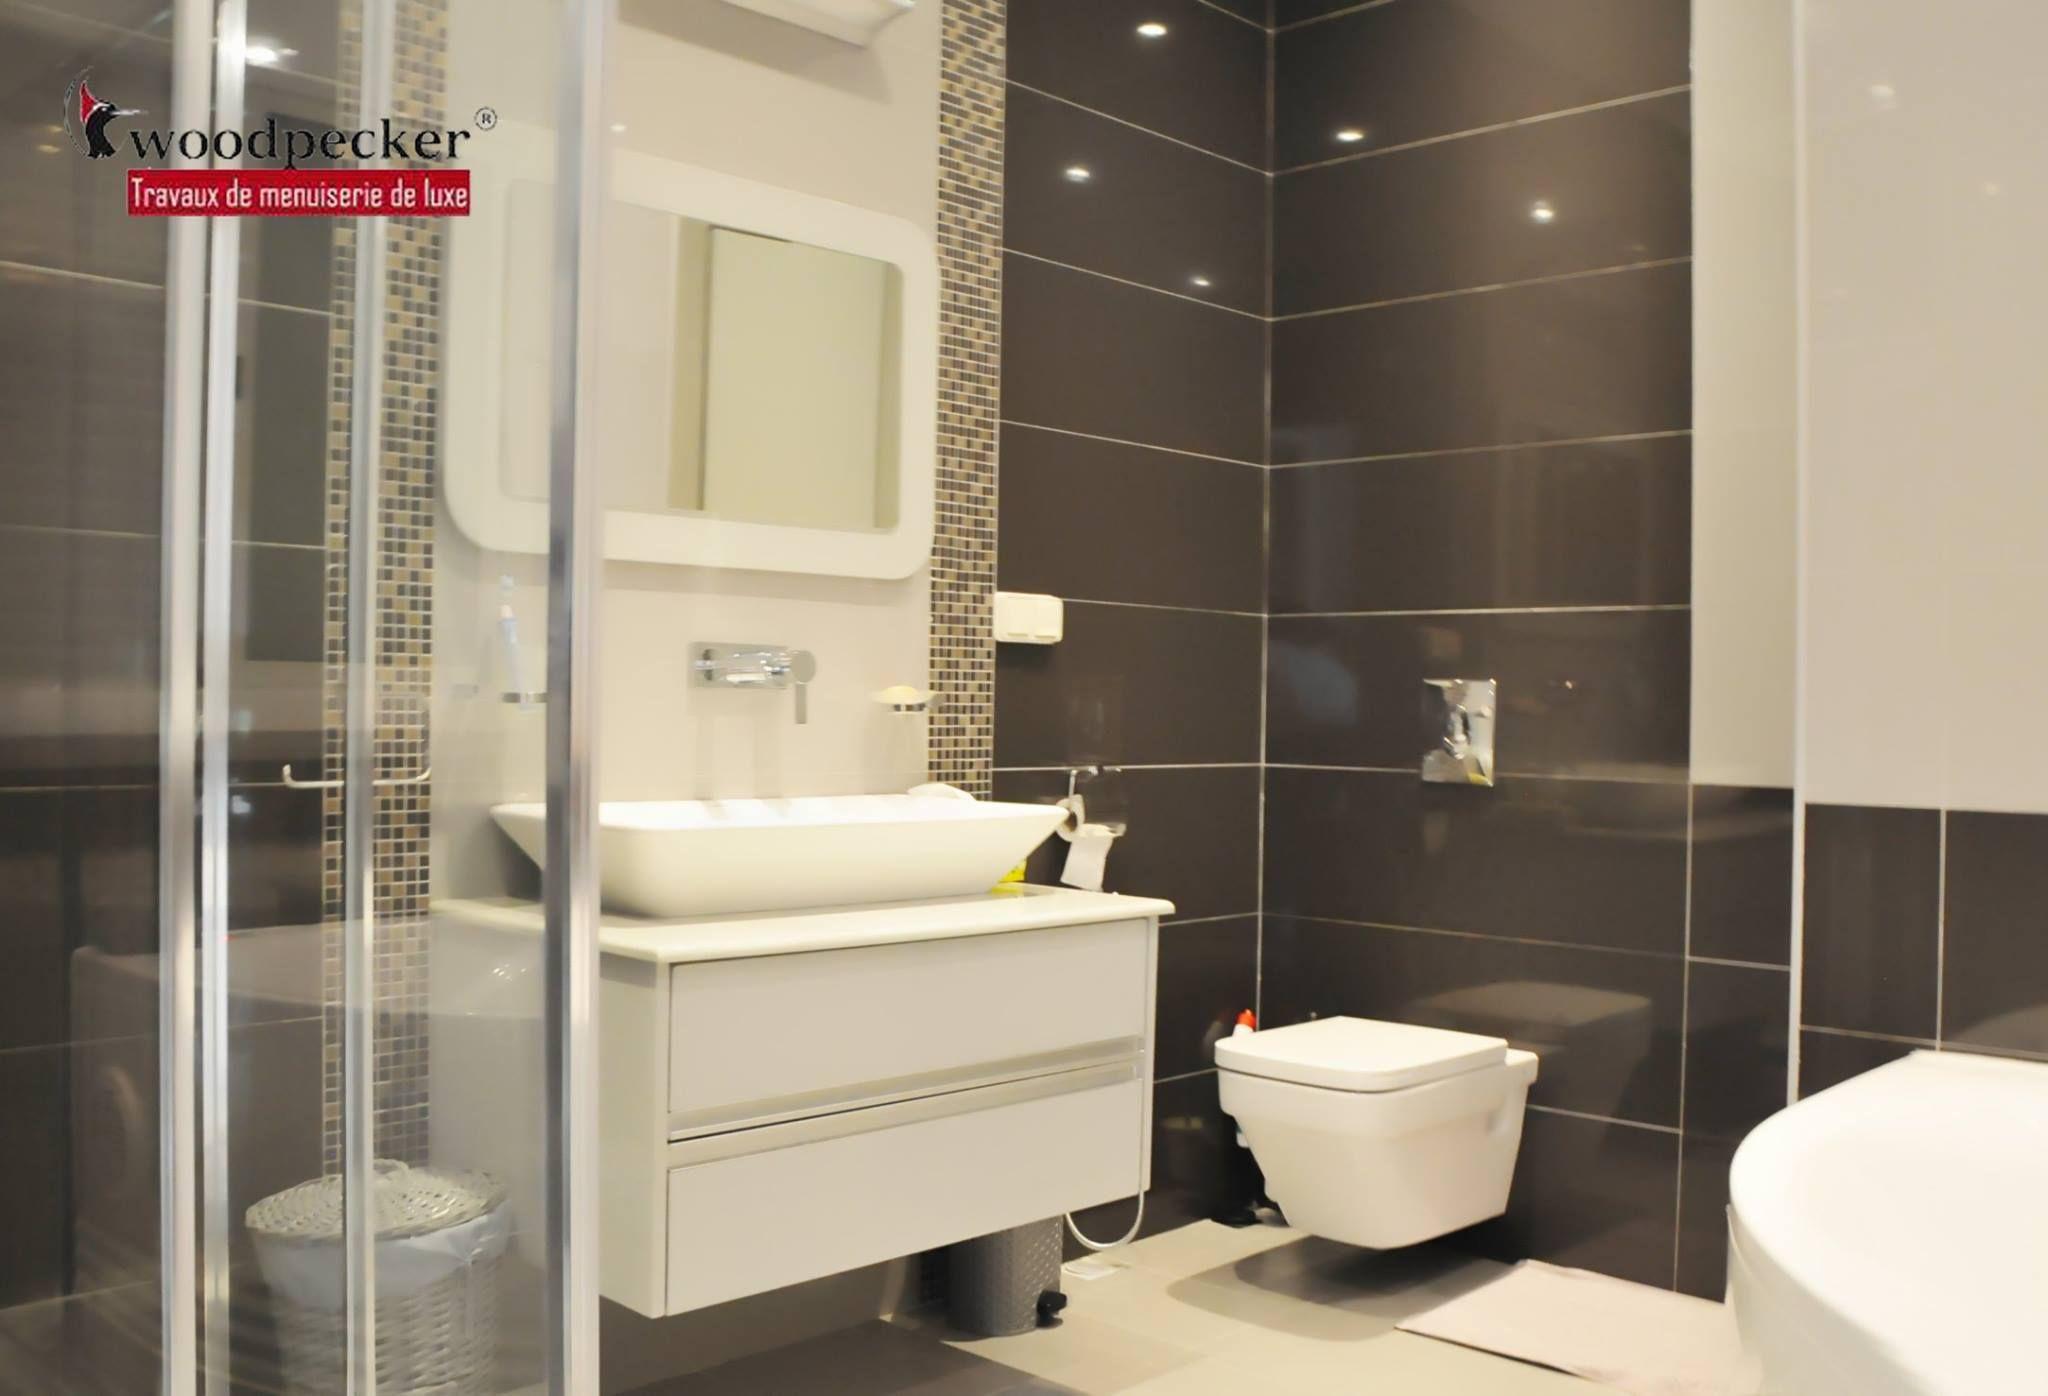 Meuble Salle De Bain Tunisie Vasque Armoire Lavabo Toilette Bathroom Model Vanity Bathroom